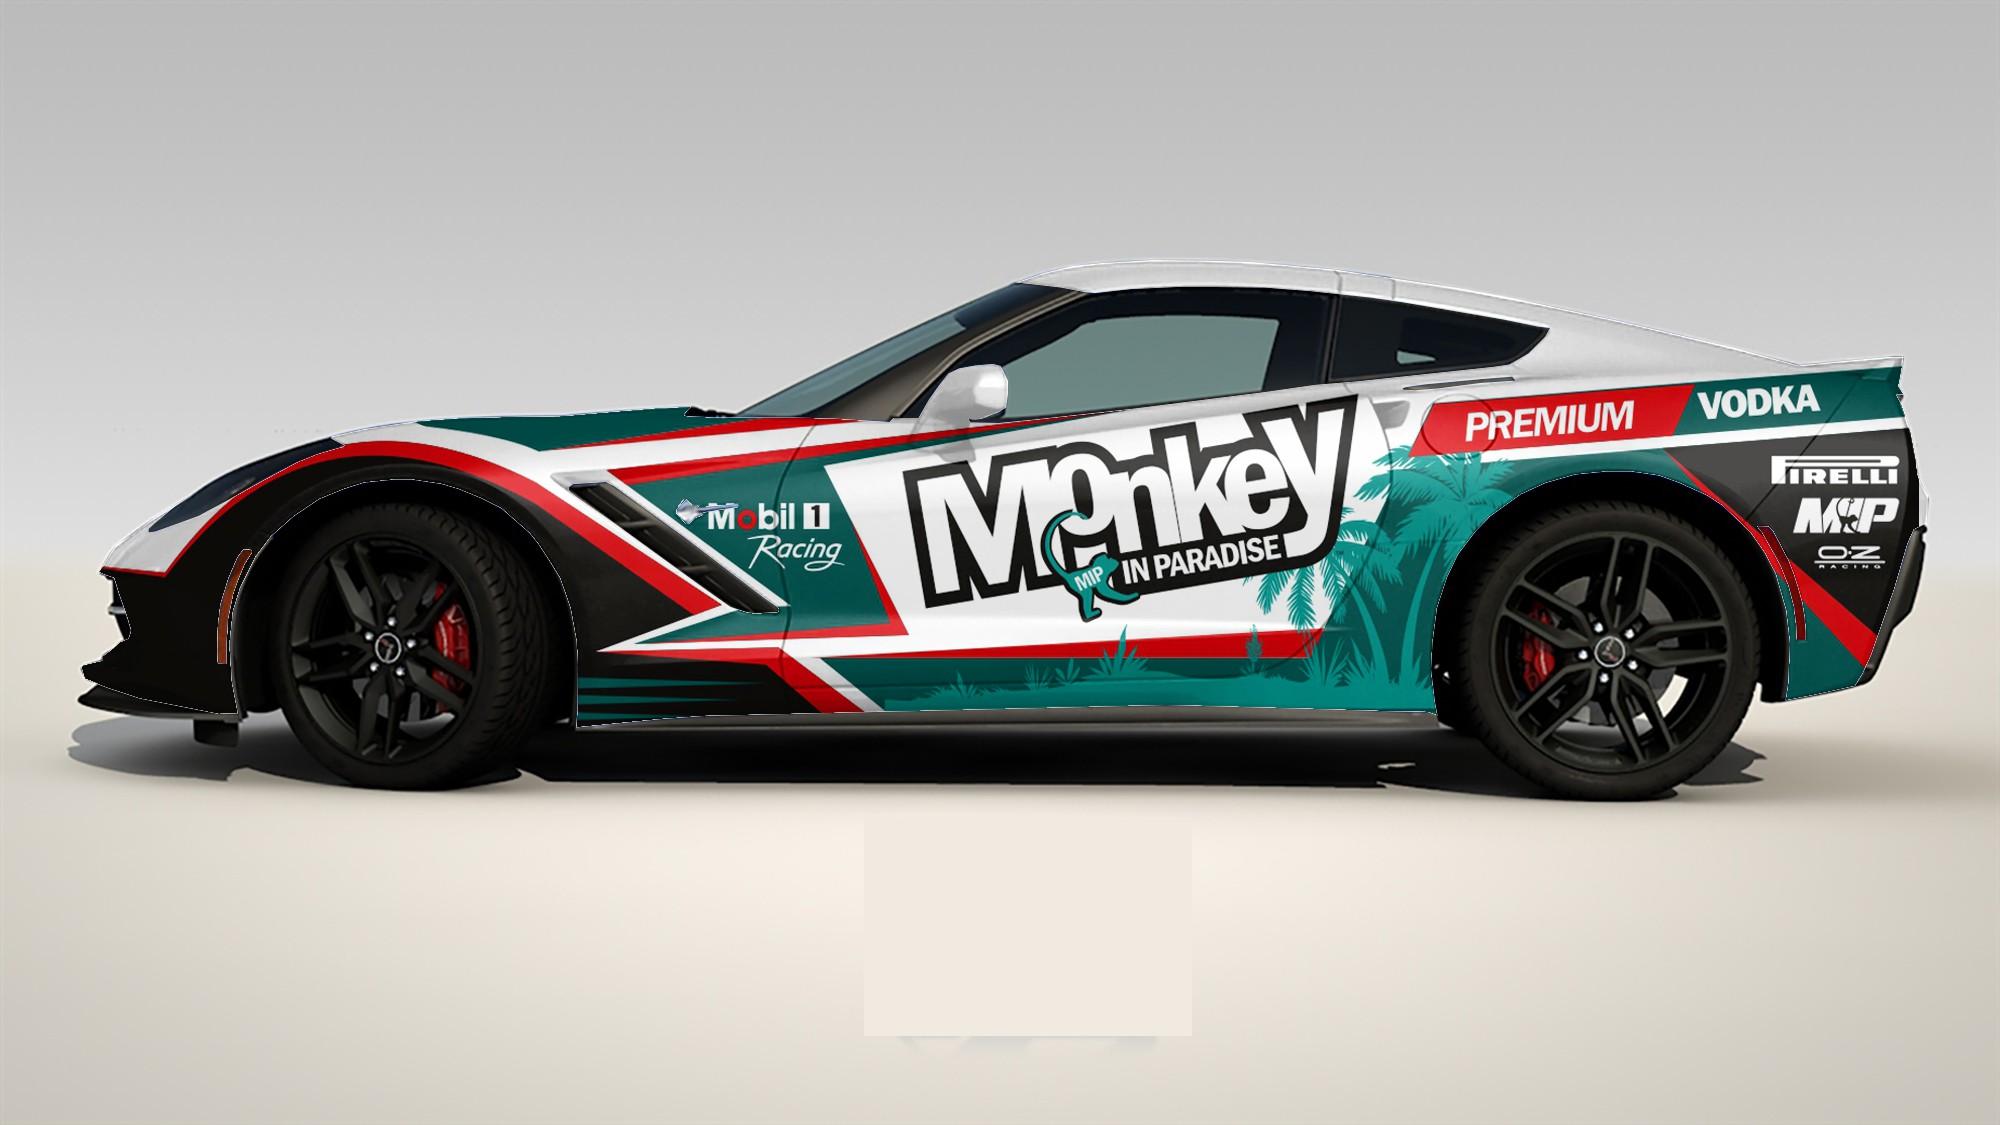 Monkey in Paradise race corvette